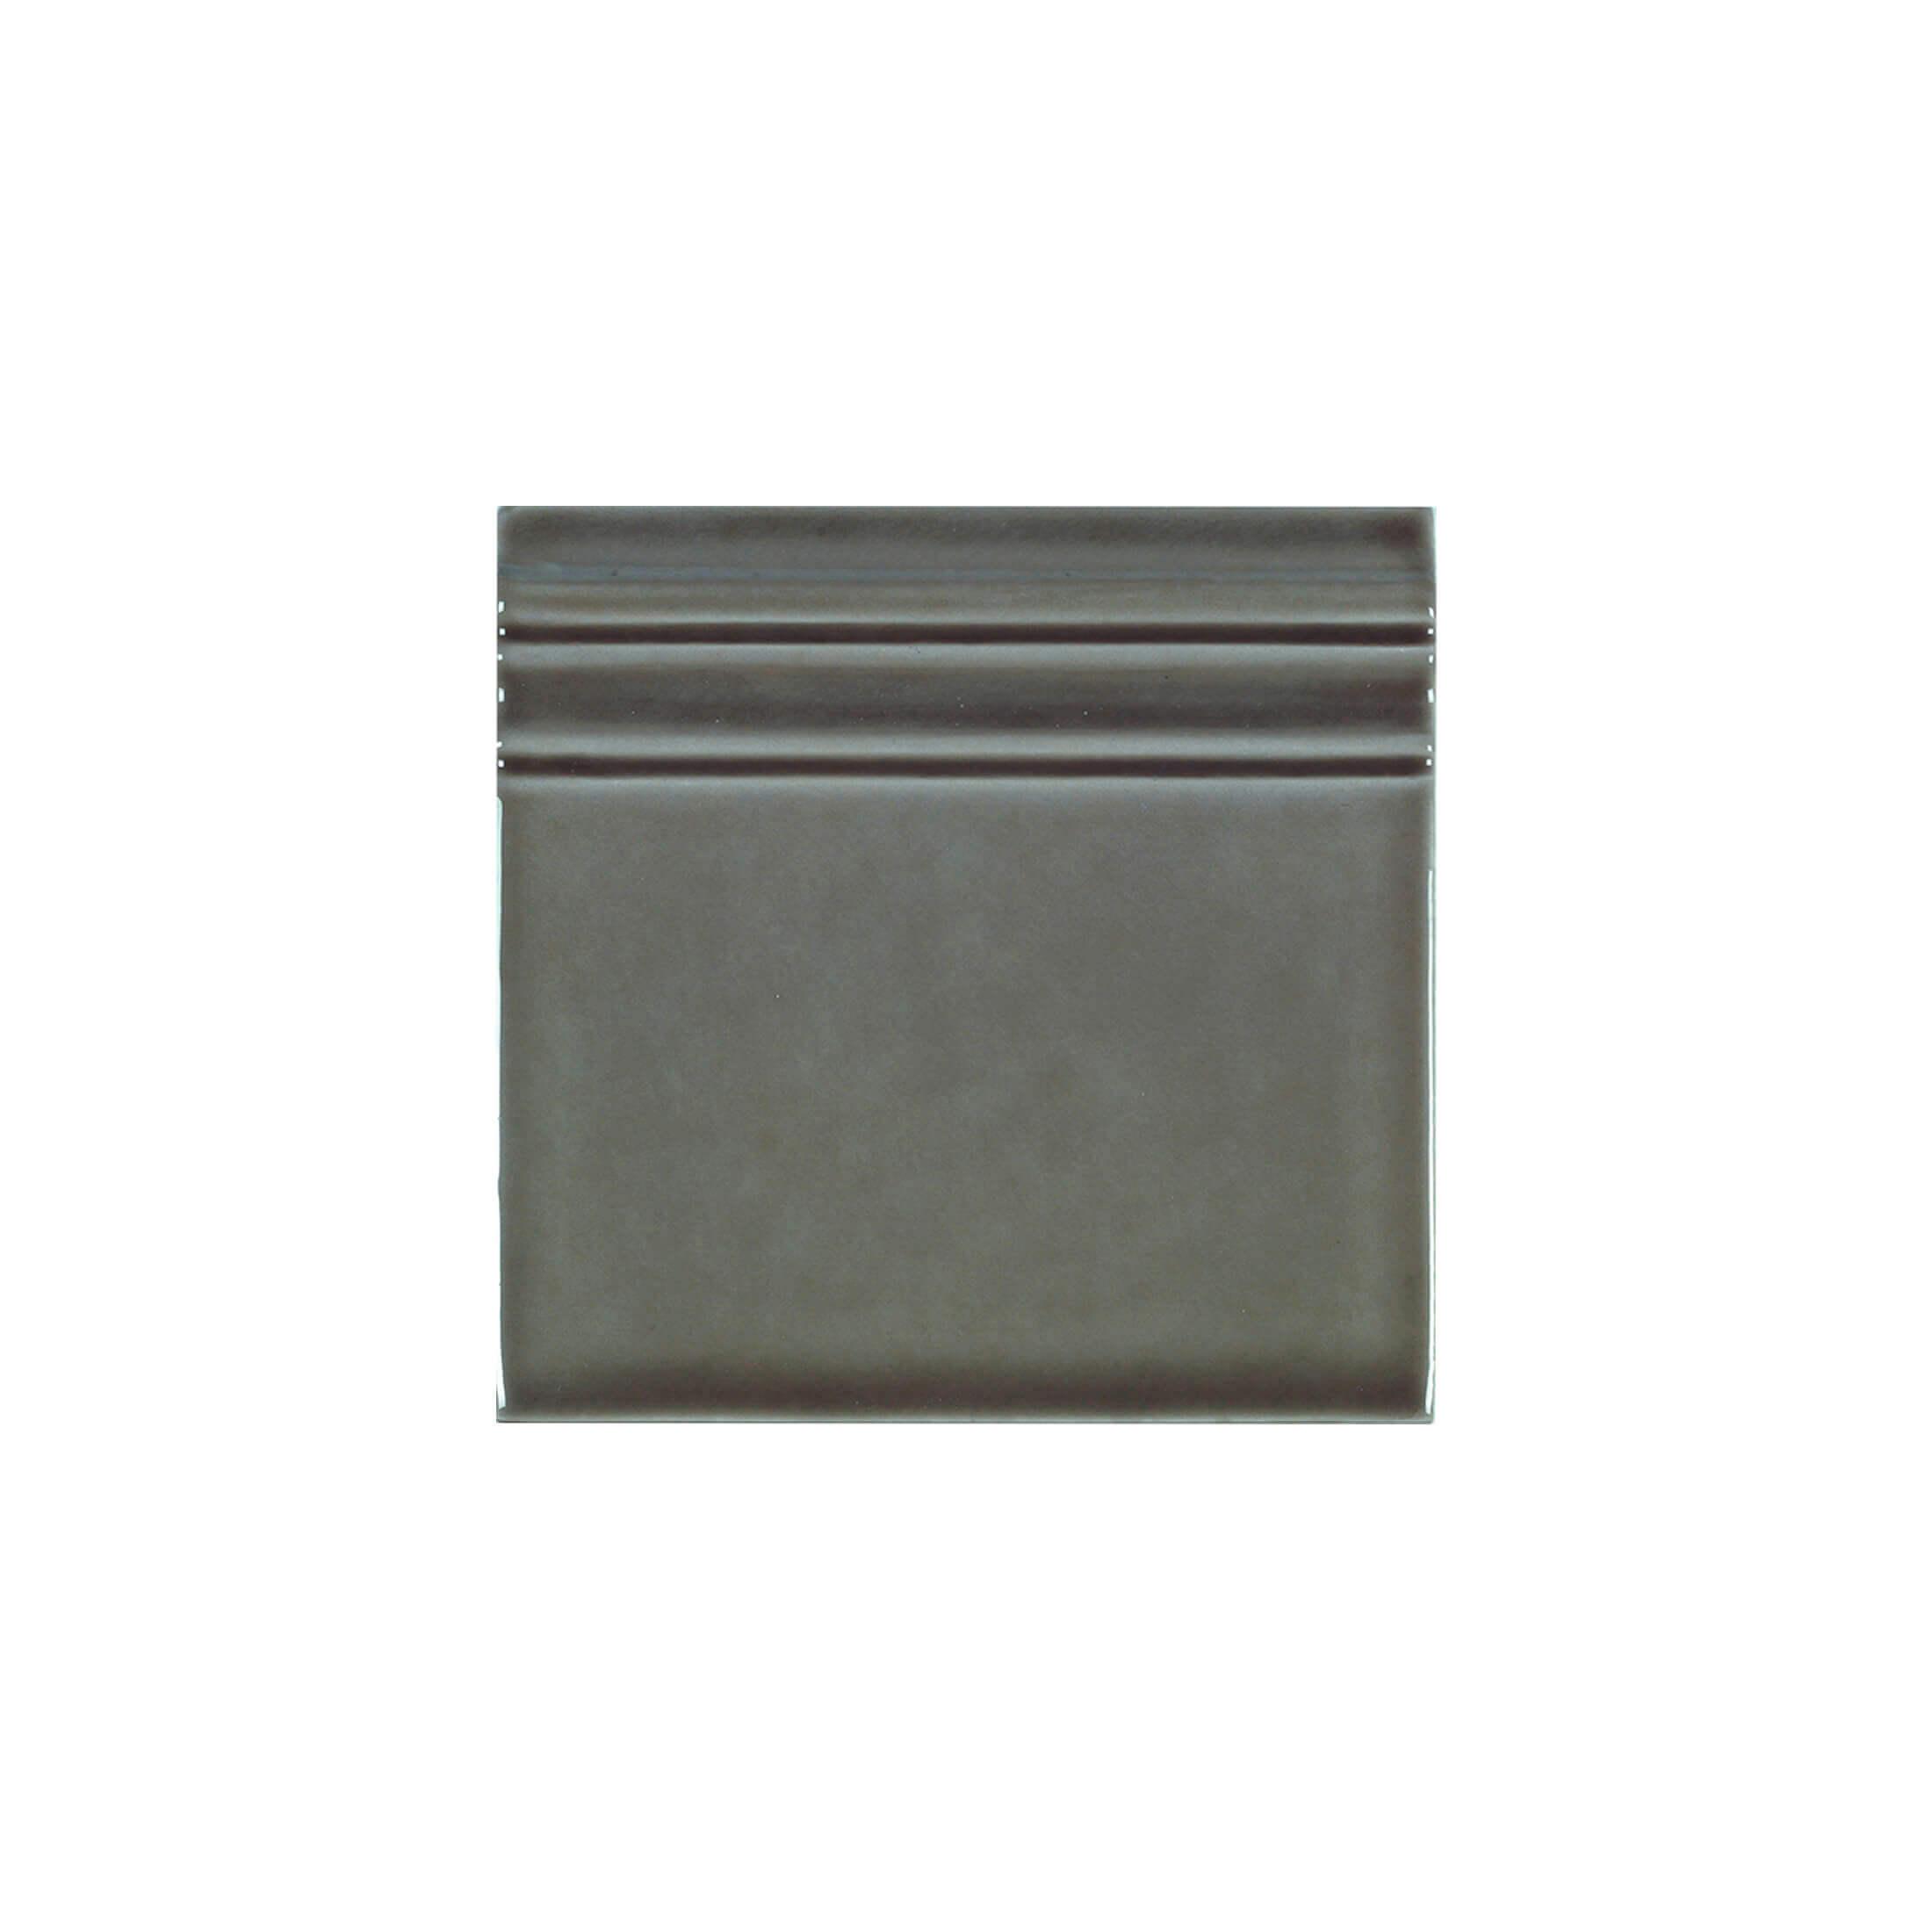 ADST5103 - RODAPIE  - 14.8 cm X 14.8 cm